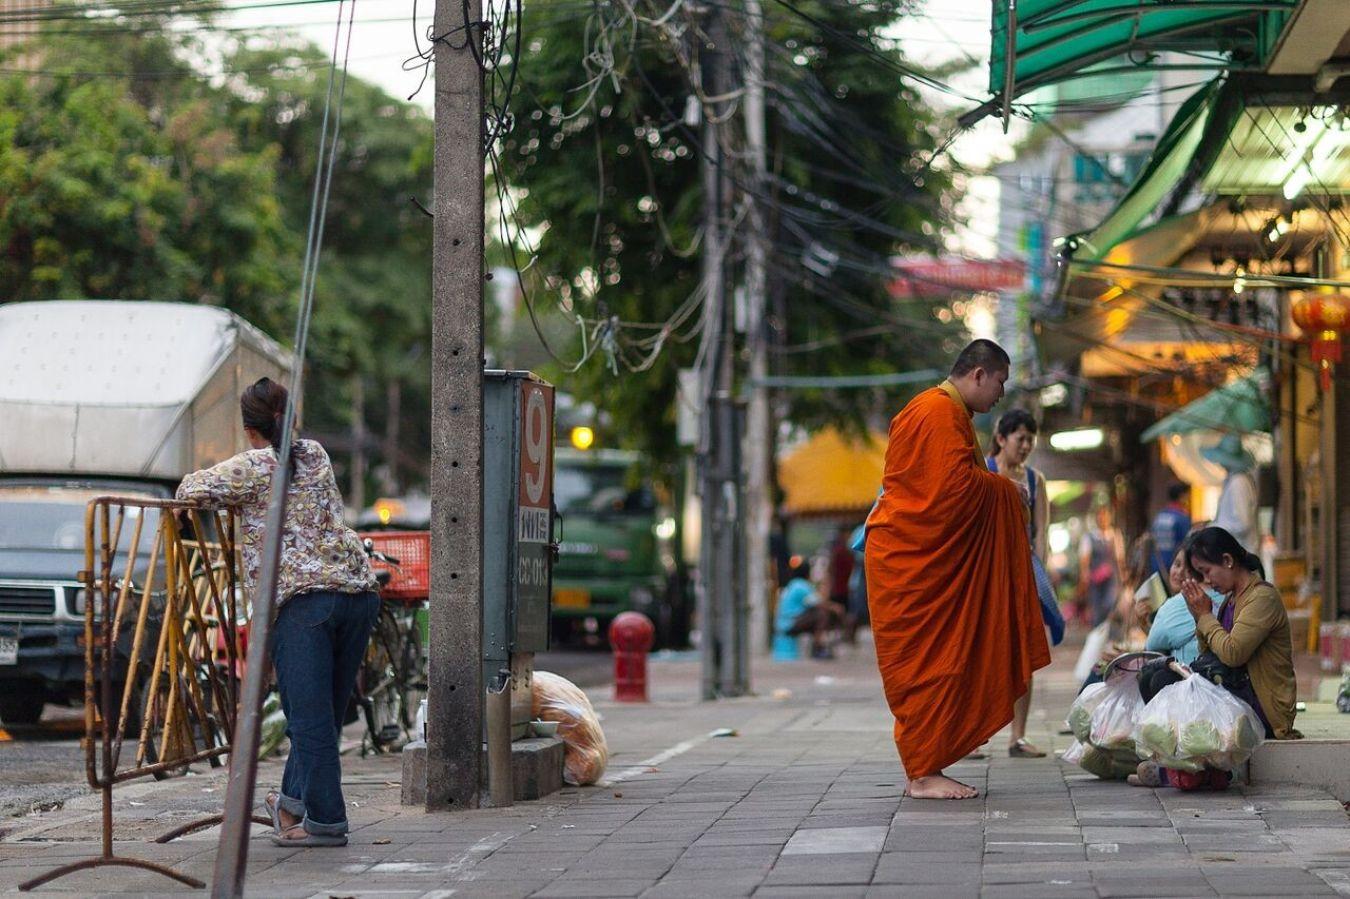 Monje budista en las calles de Bangkok, Tailandia